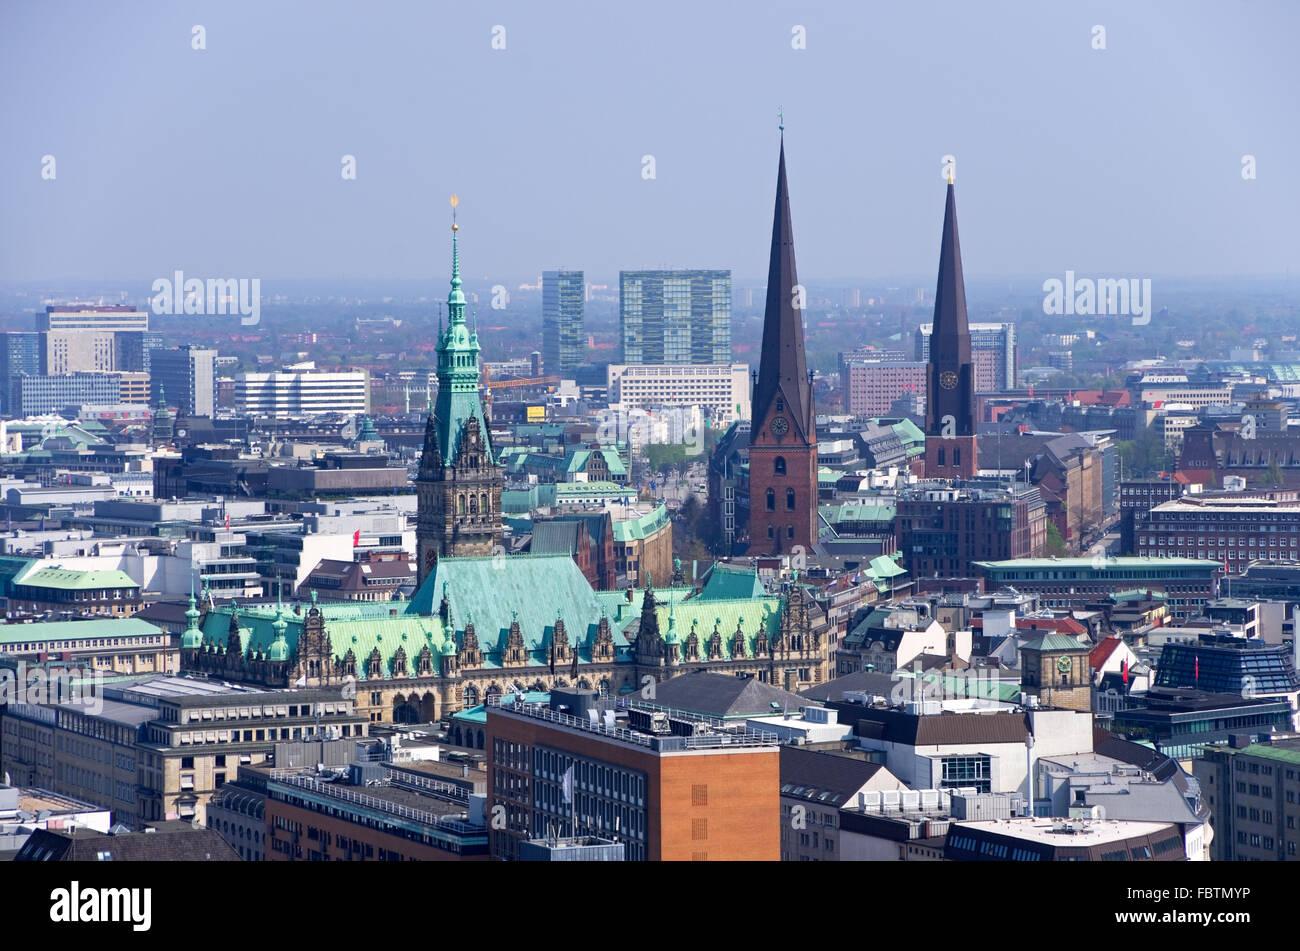 hamburg skyline - Stock Image